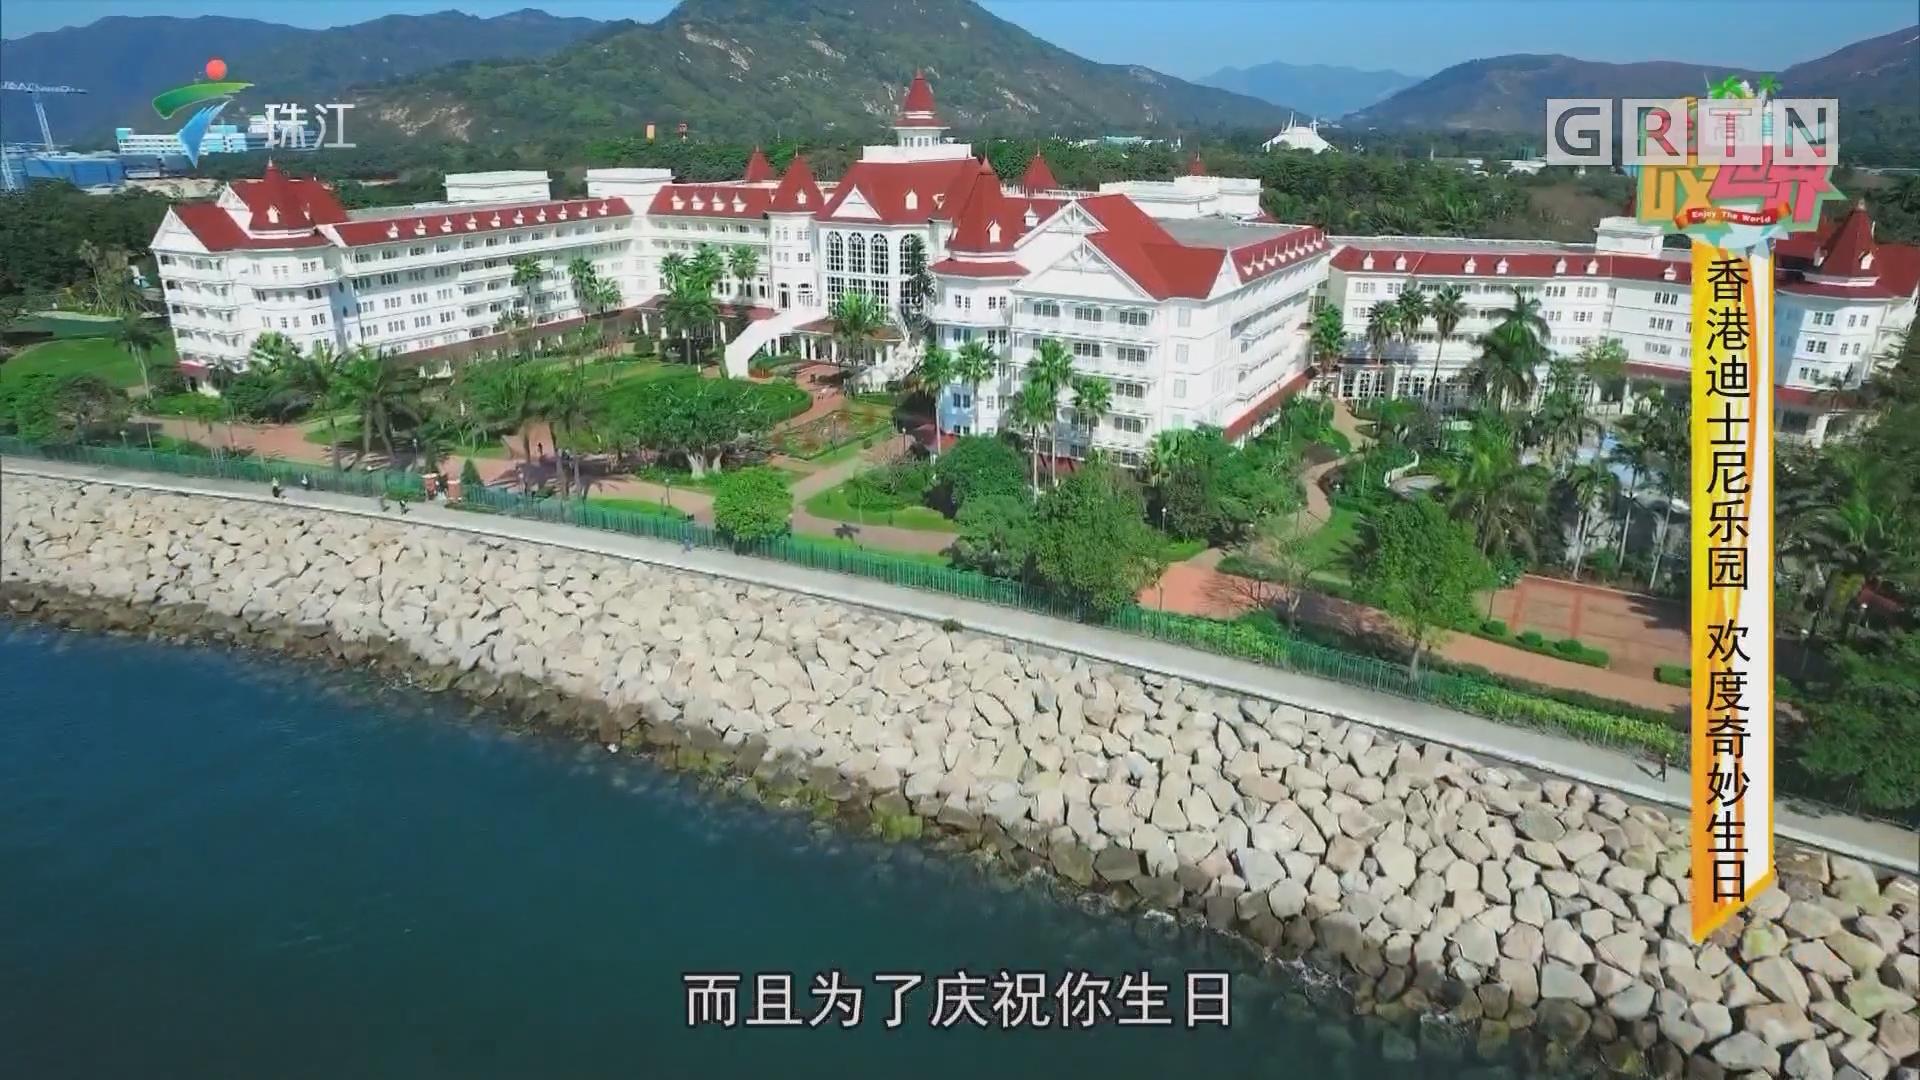 [HD][2019-05-10]全民叹世界:香港迪士尼乐园 欢度奇妙生日